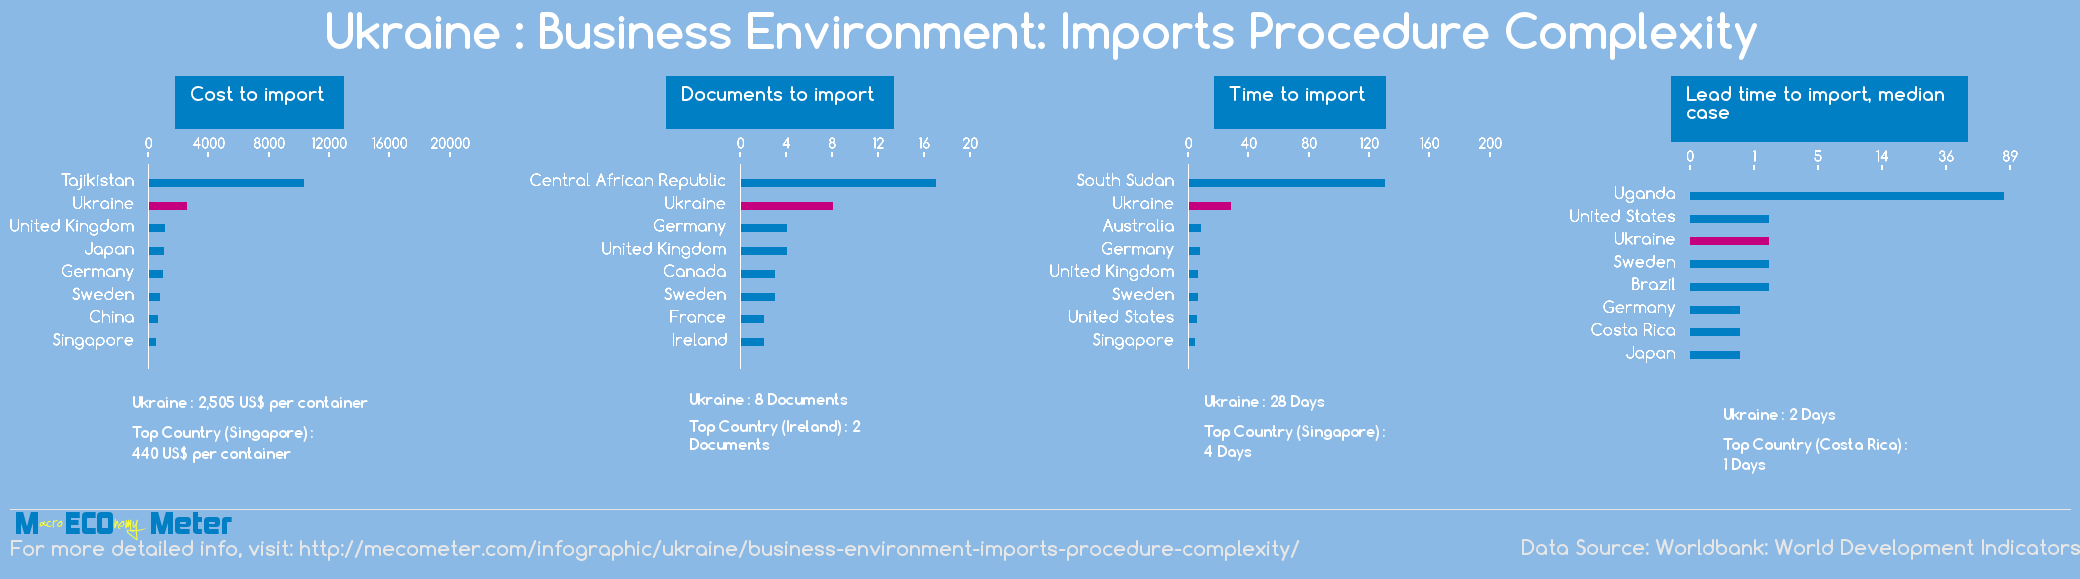 Ukraine : Business Environment: Imports Procedure Complexity